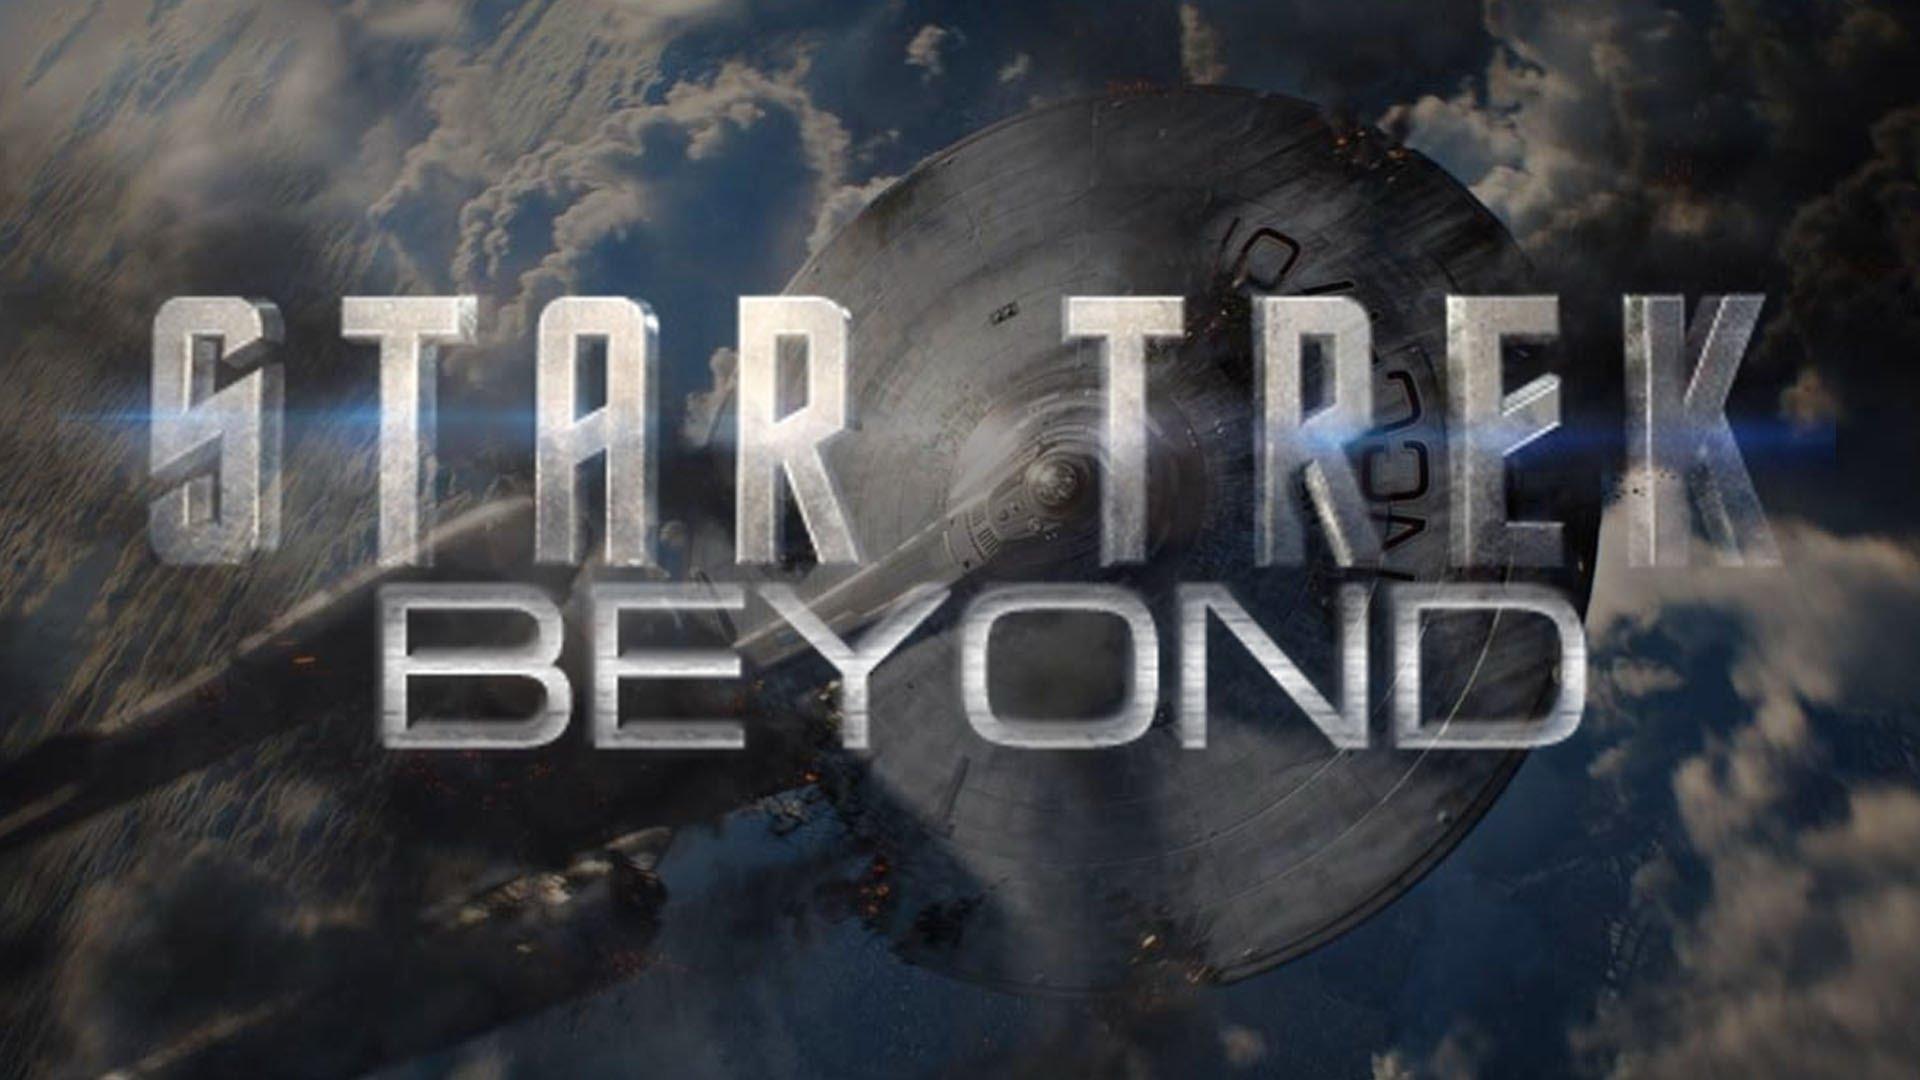 novo trailer de star trek beyond